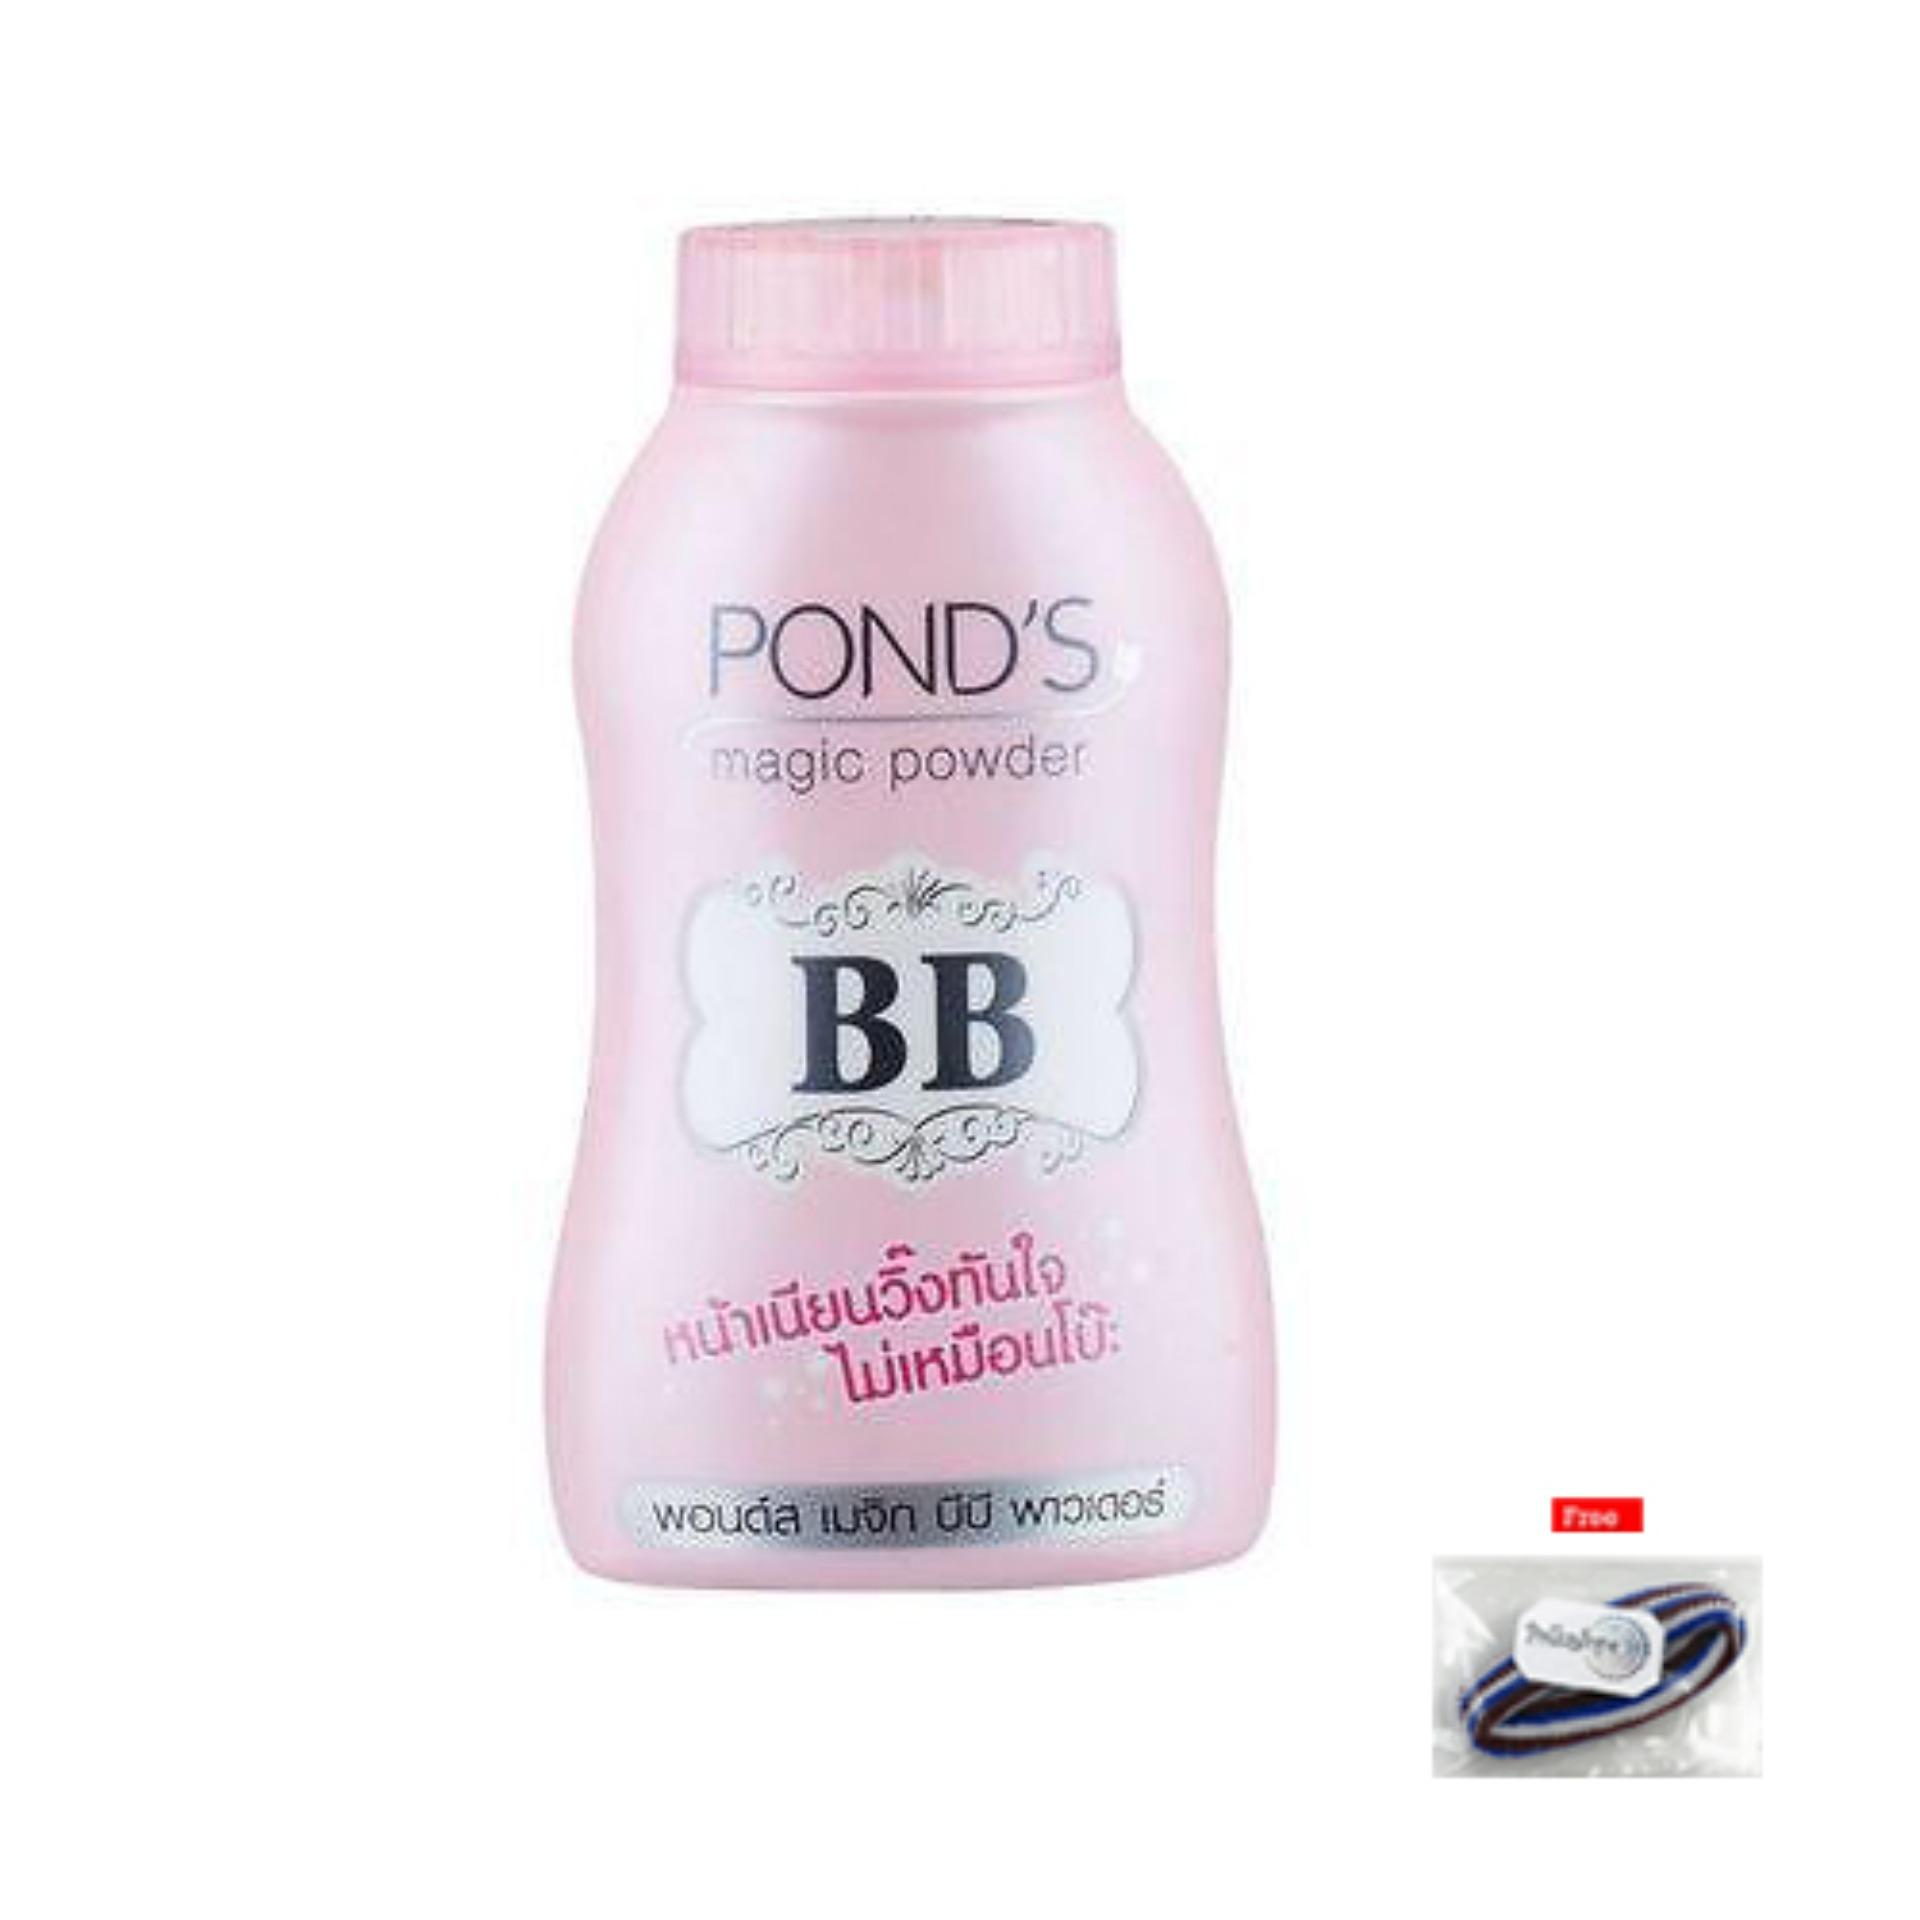 Ponds BB Magic Powder 100% Original Thailand - Bedak BB Ponds - Bedak Glossy +